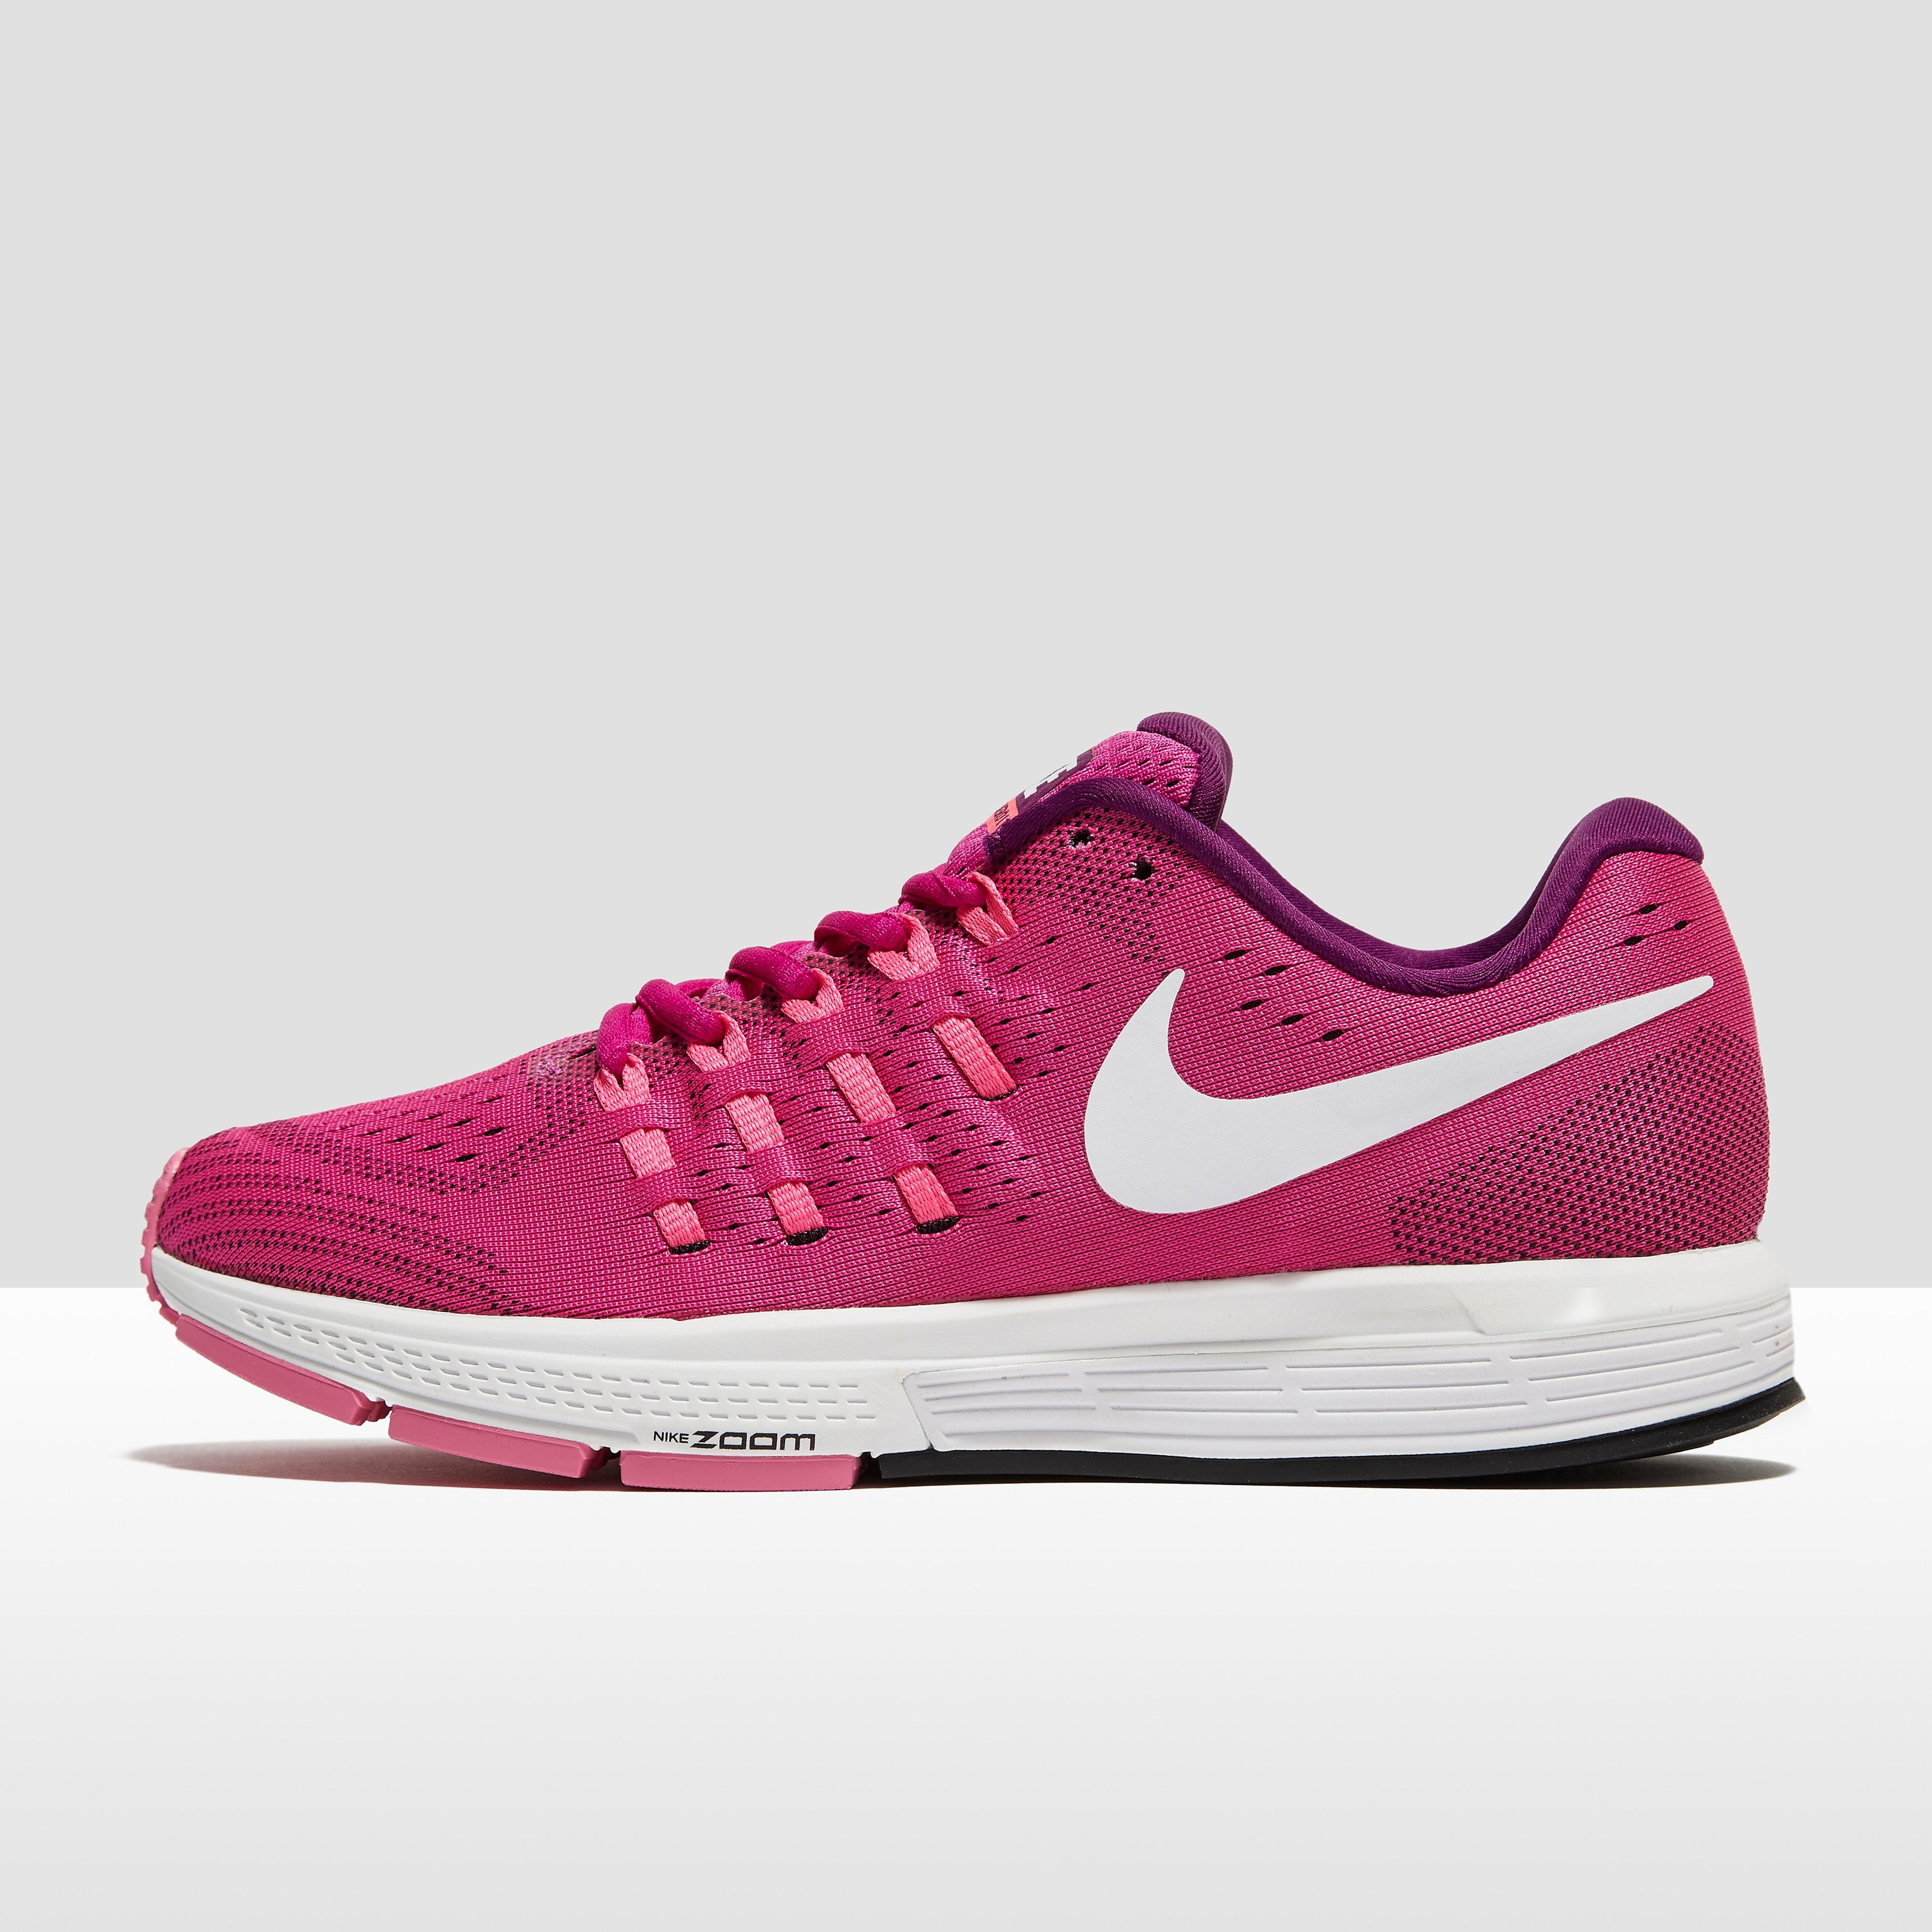 Nike Air Zoom Vomero Women's Running Shoes